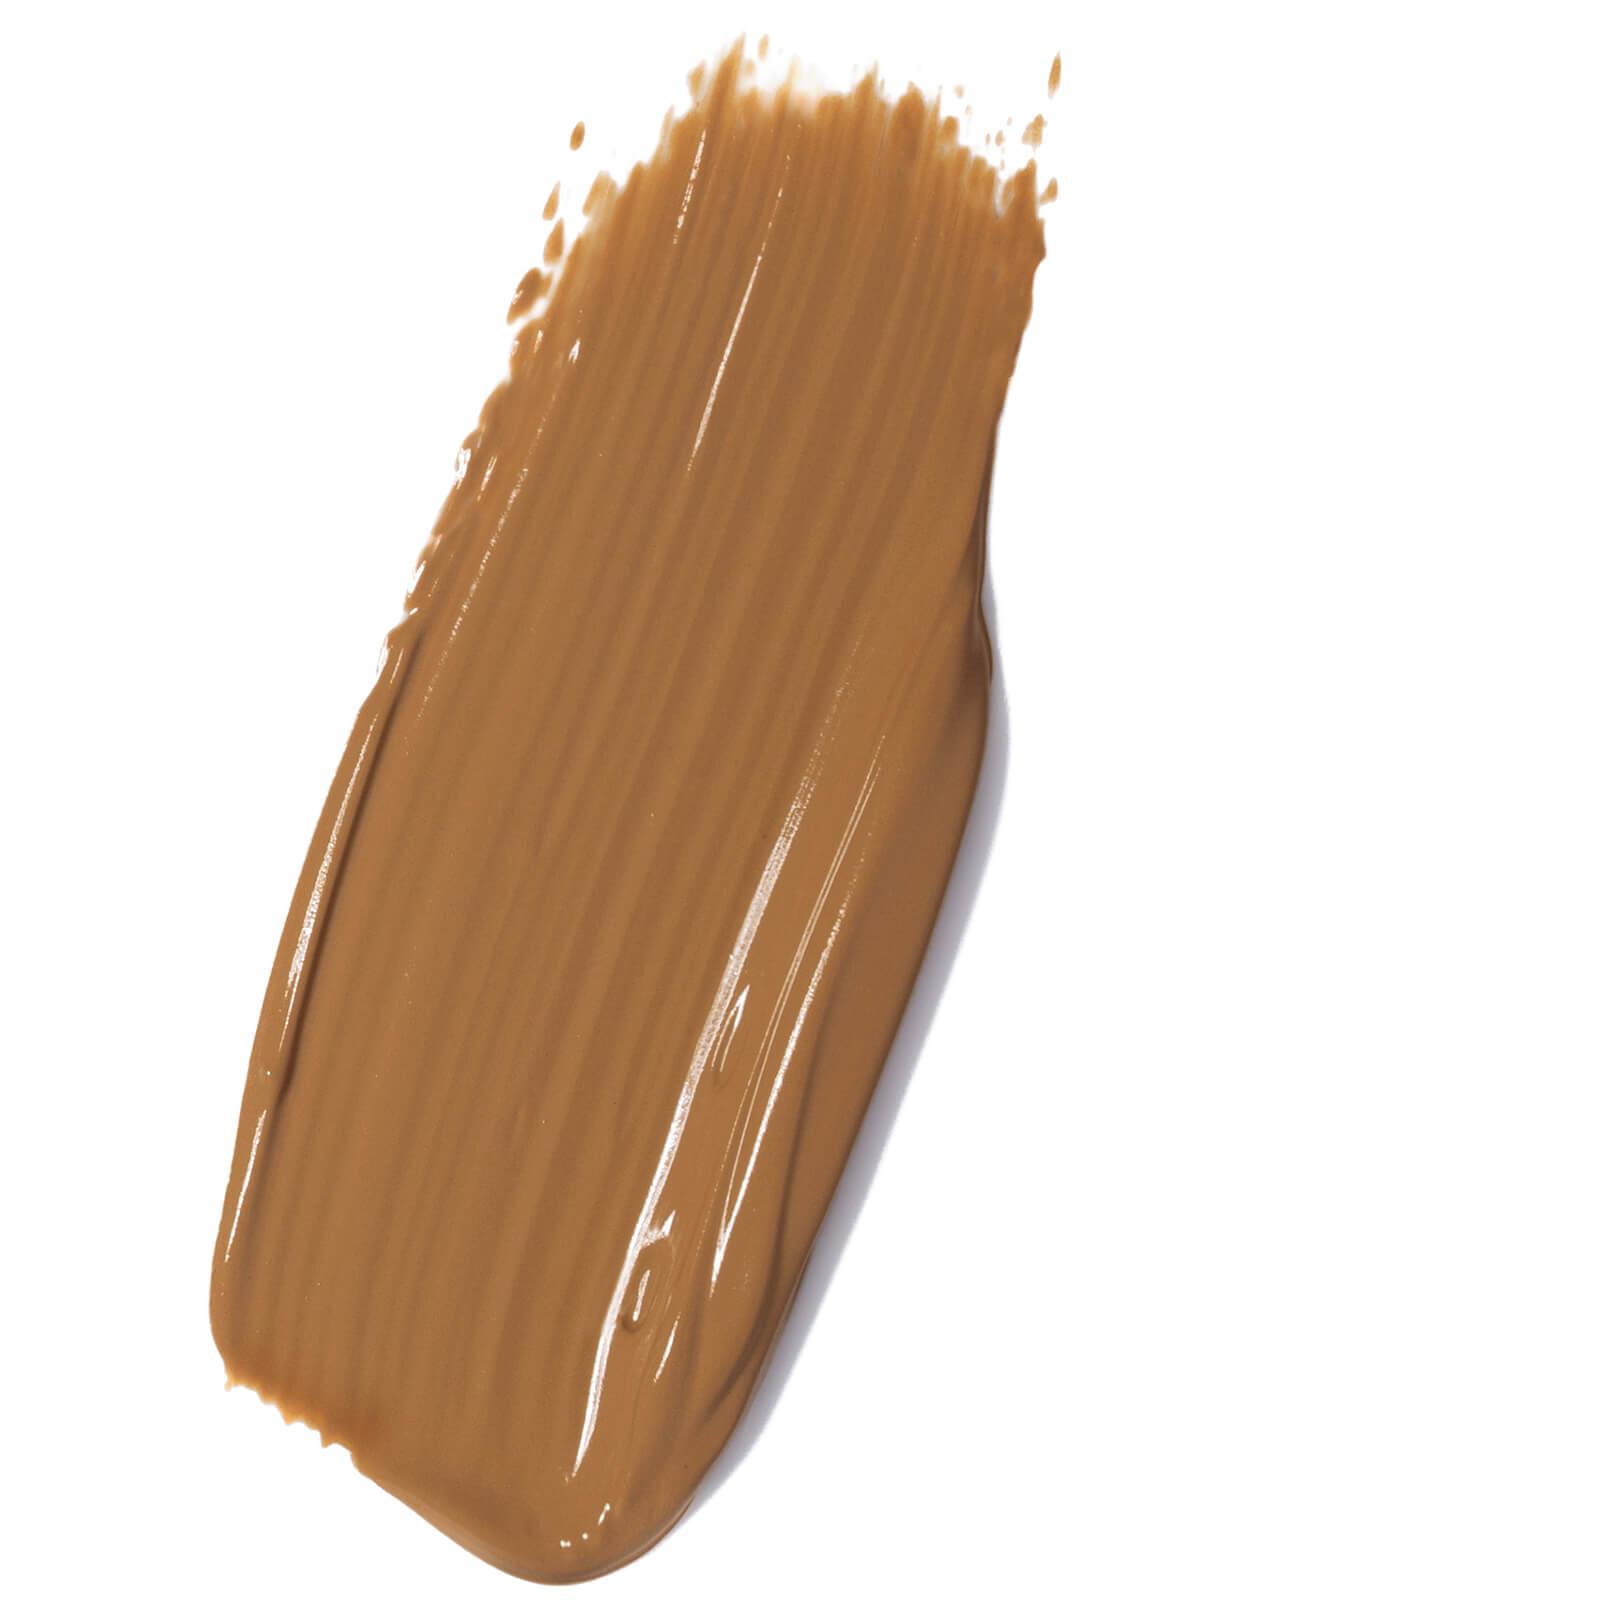 Chantecaille Future Skin Oil-Free Foundation 30g - Banana